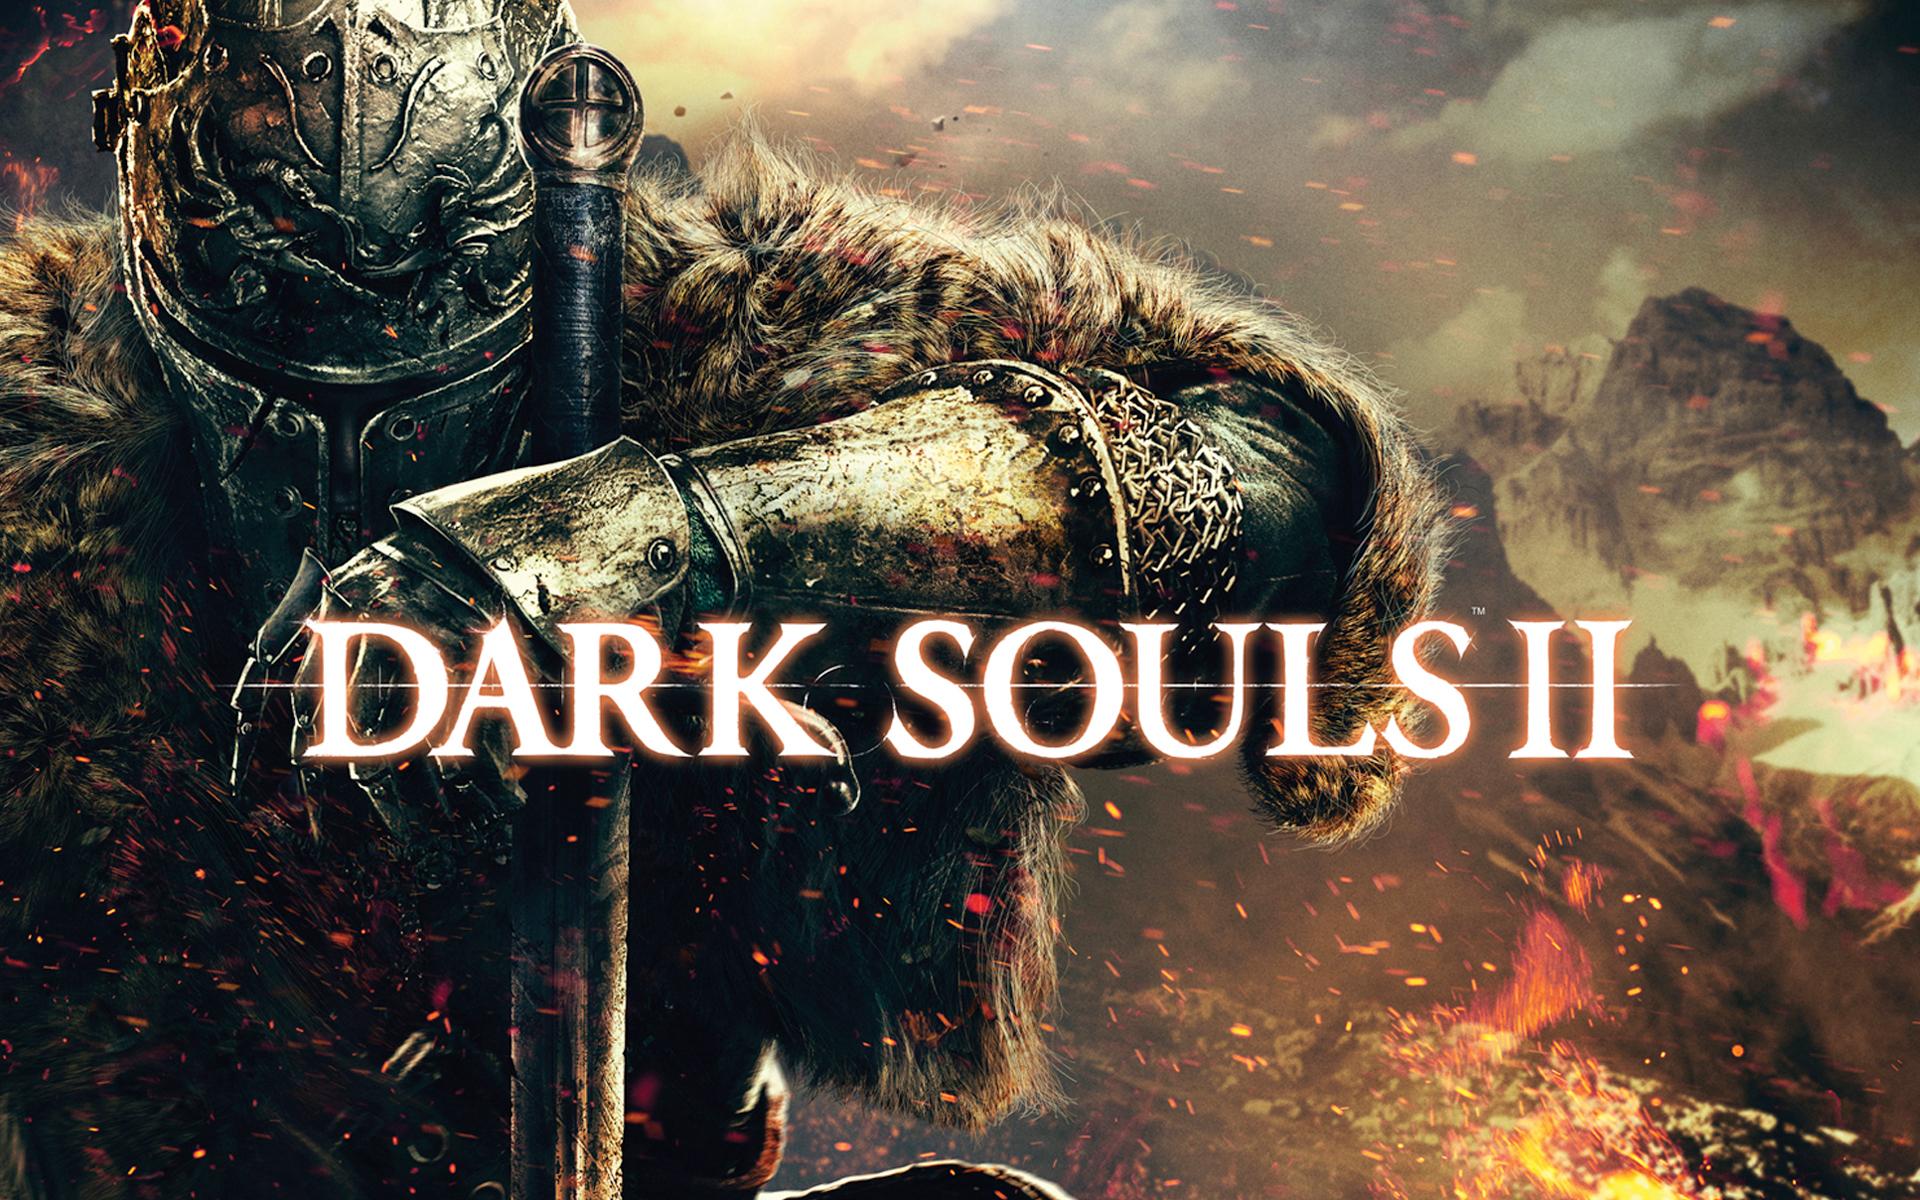 dark souls 2 II game knight hd wallpaper image picture photo 1920x1200